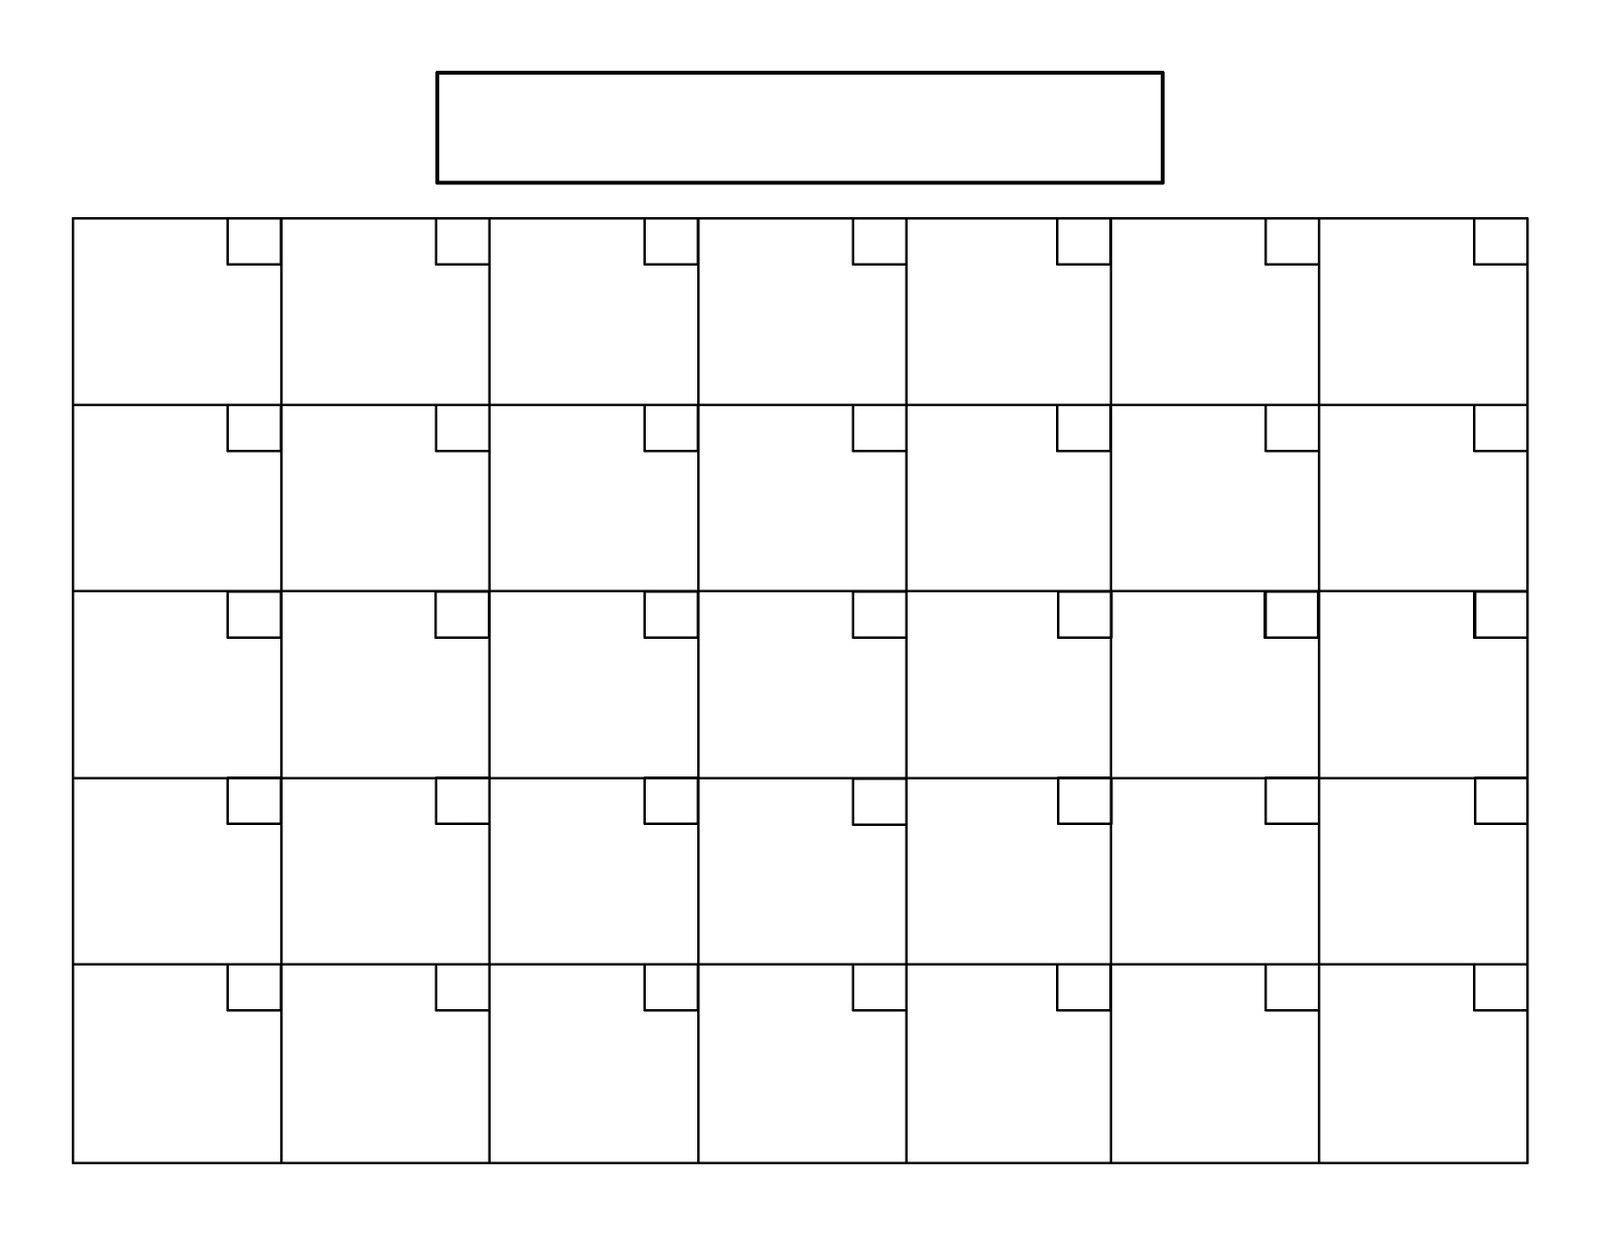 Printable 5 Day Calendar   Calendar Printables, Monthly  Blank 30-Day Calendar